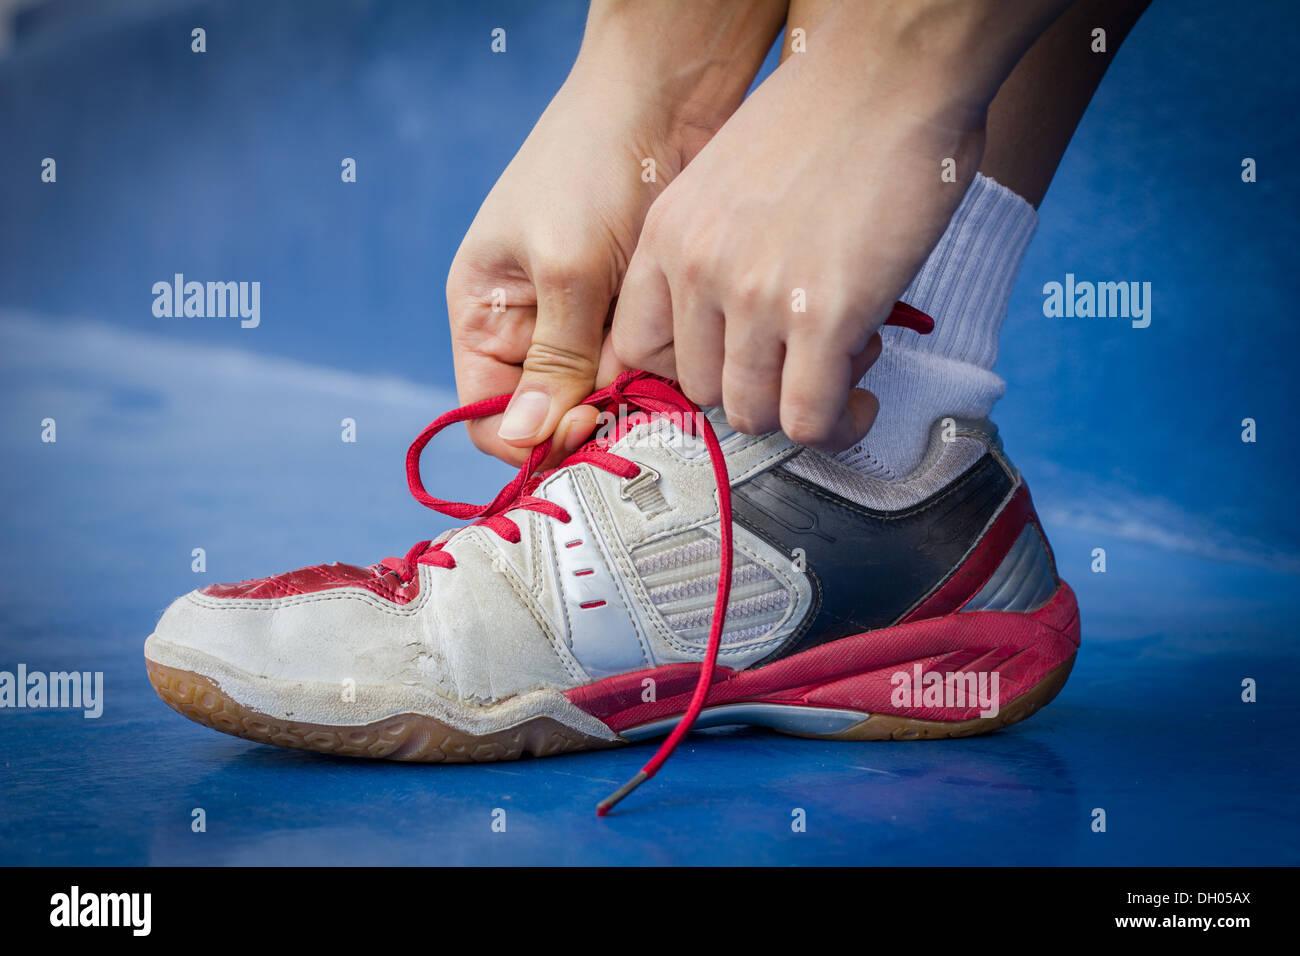 Calzado deportivo atado Imagen De Stock